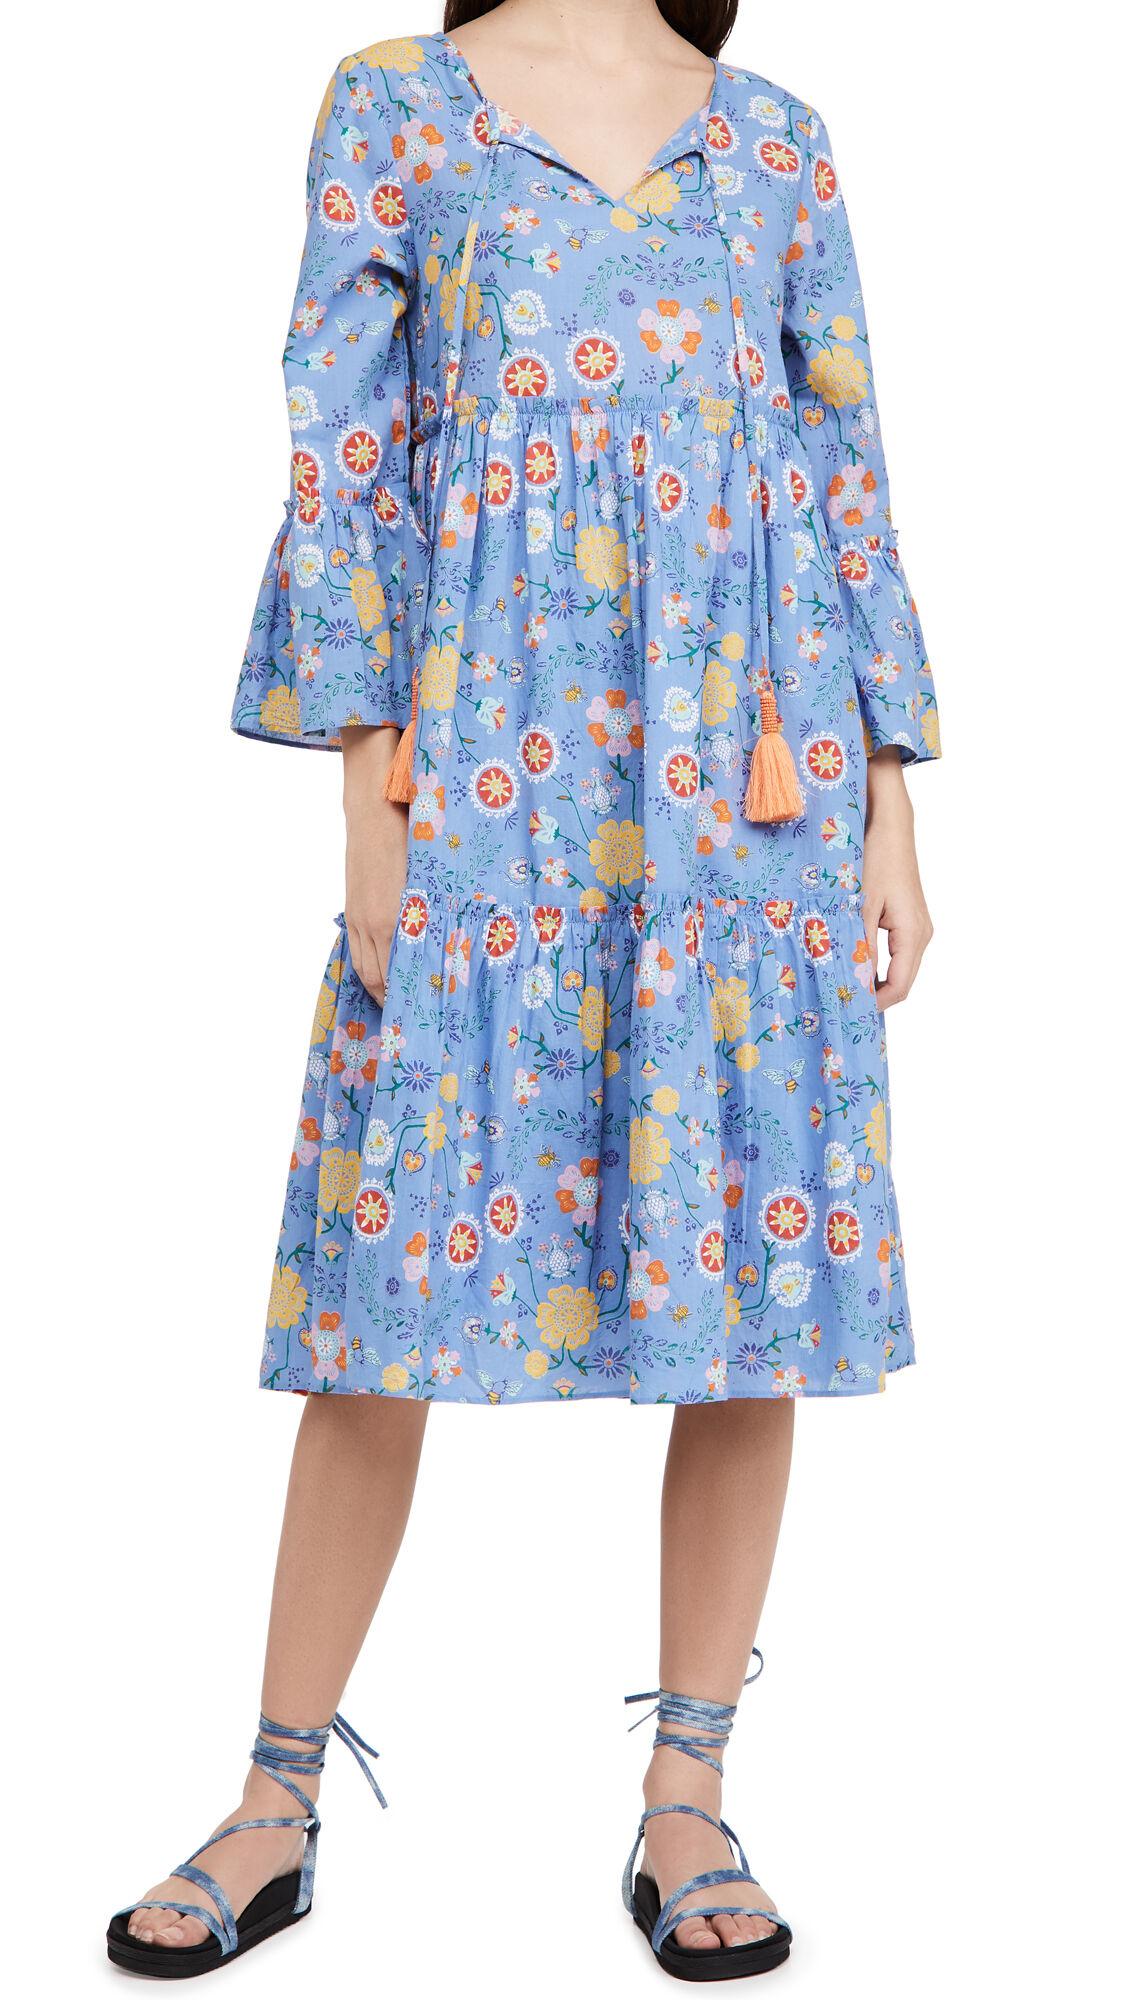 Ro's Garden Dulce Dress  - Gardenia - Size: Large